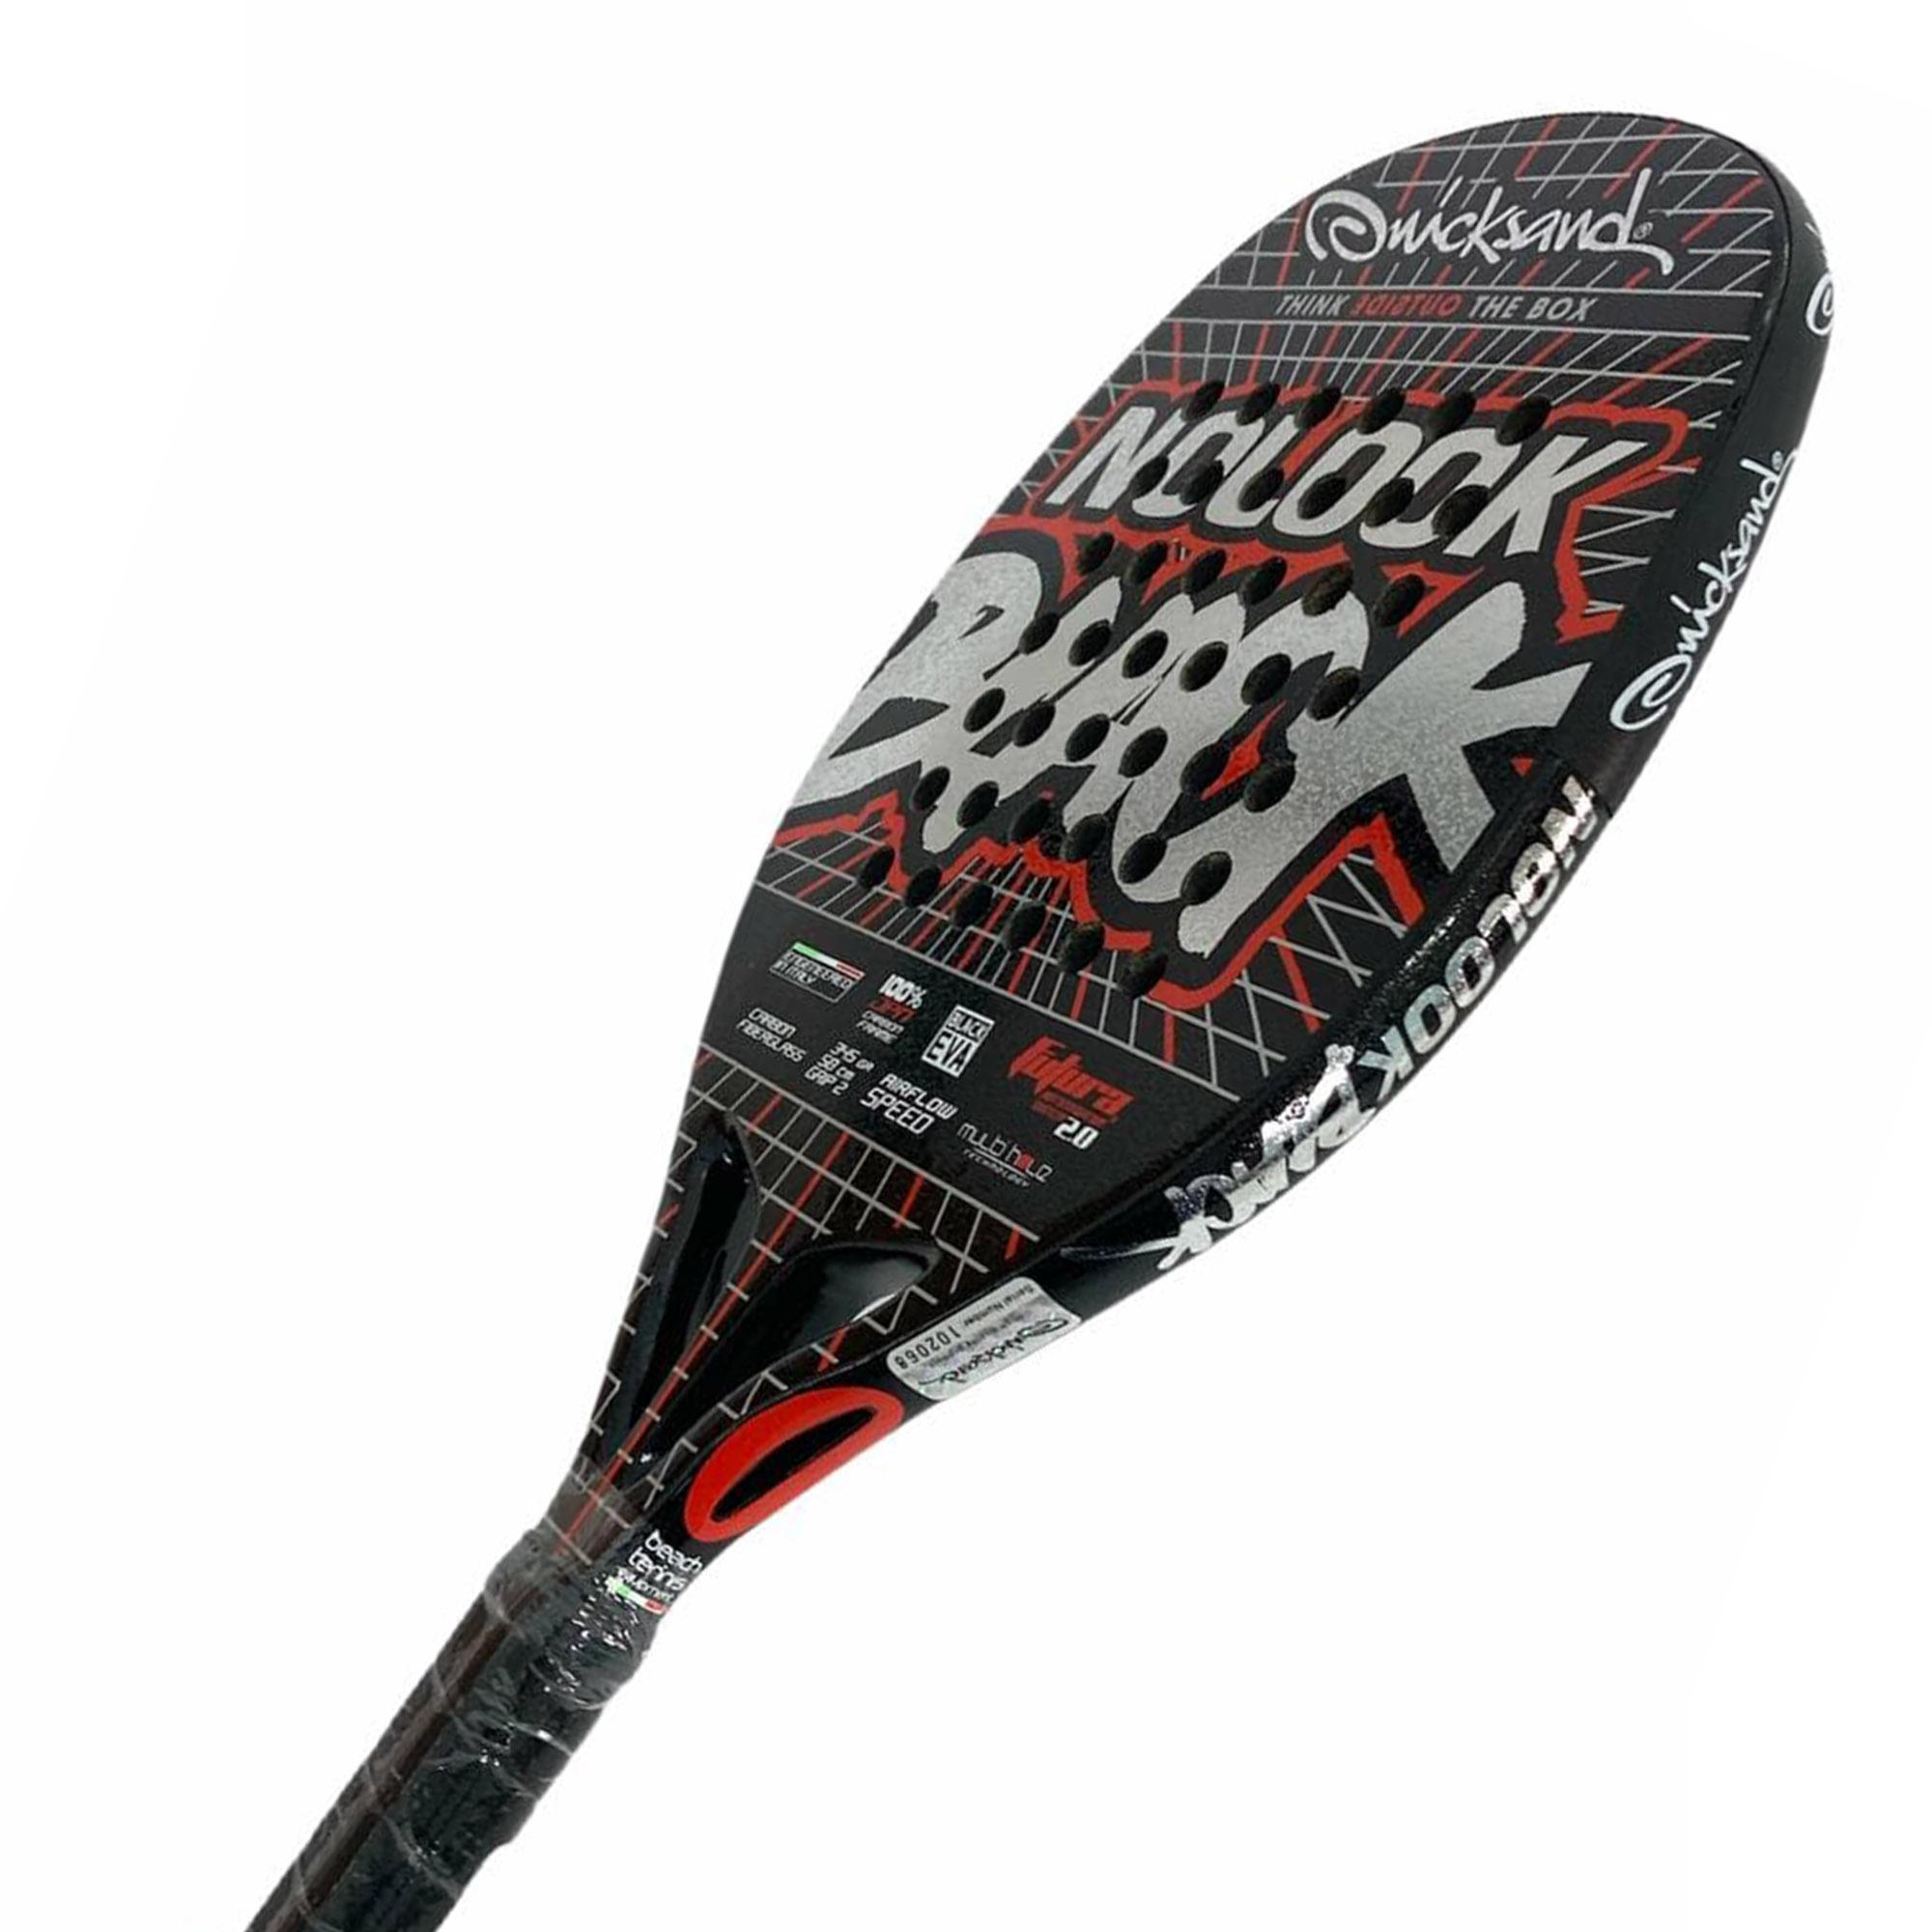 Raquete de Beach Tennis Quicksand Nolook Black